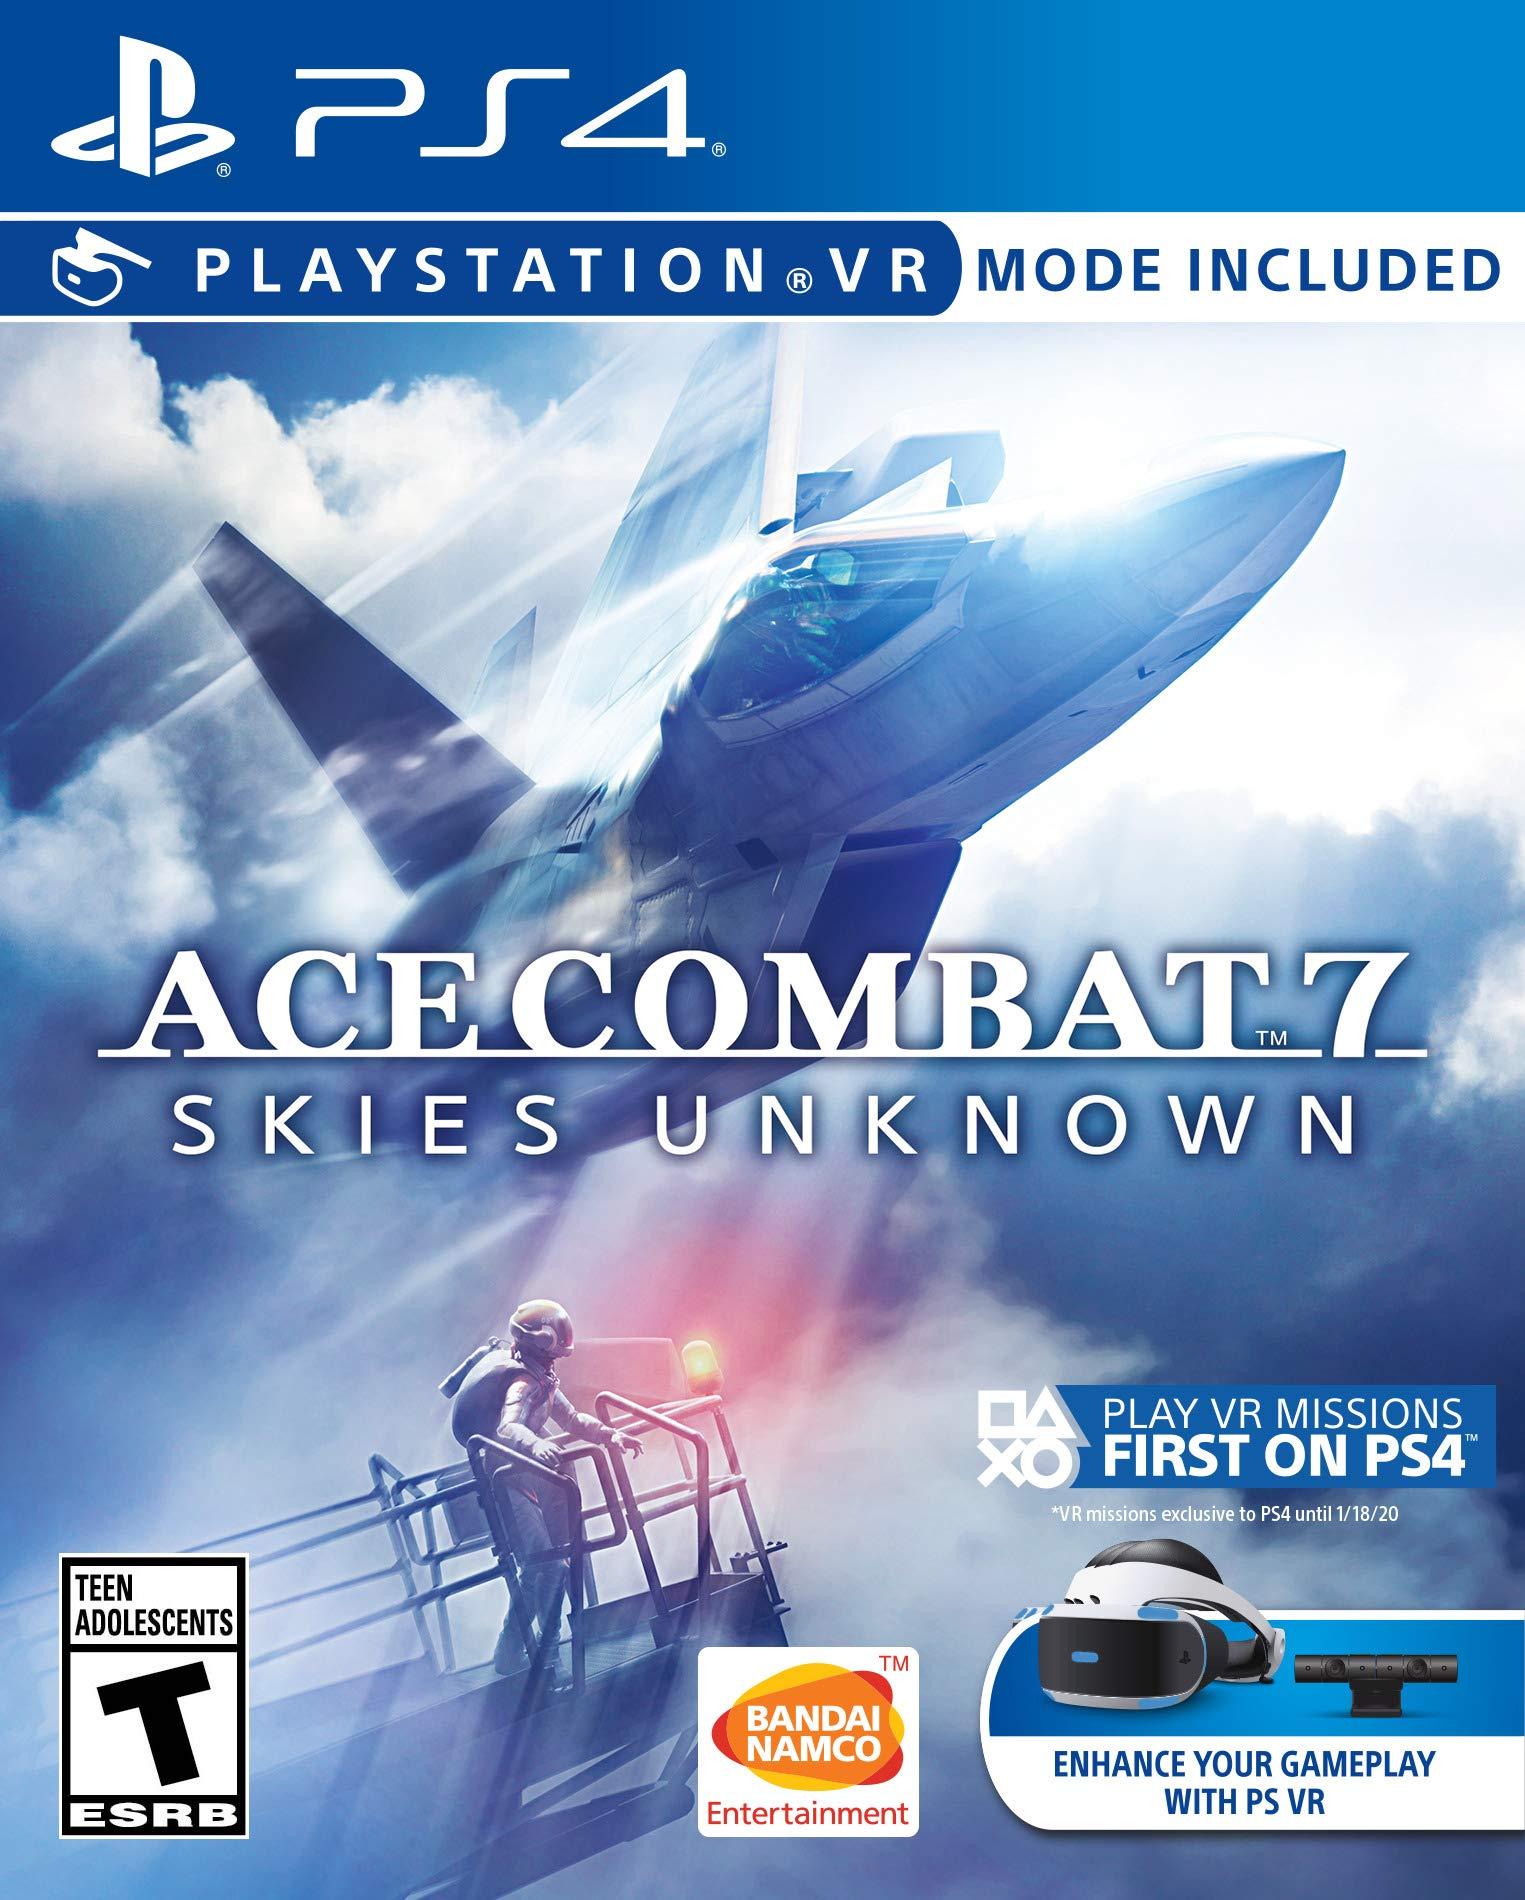 Buy Ace Combat Now!